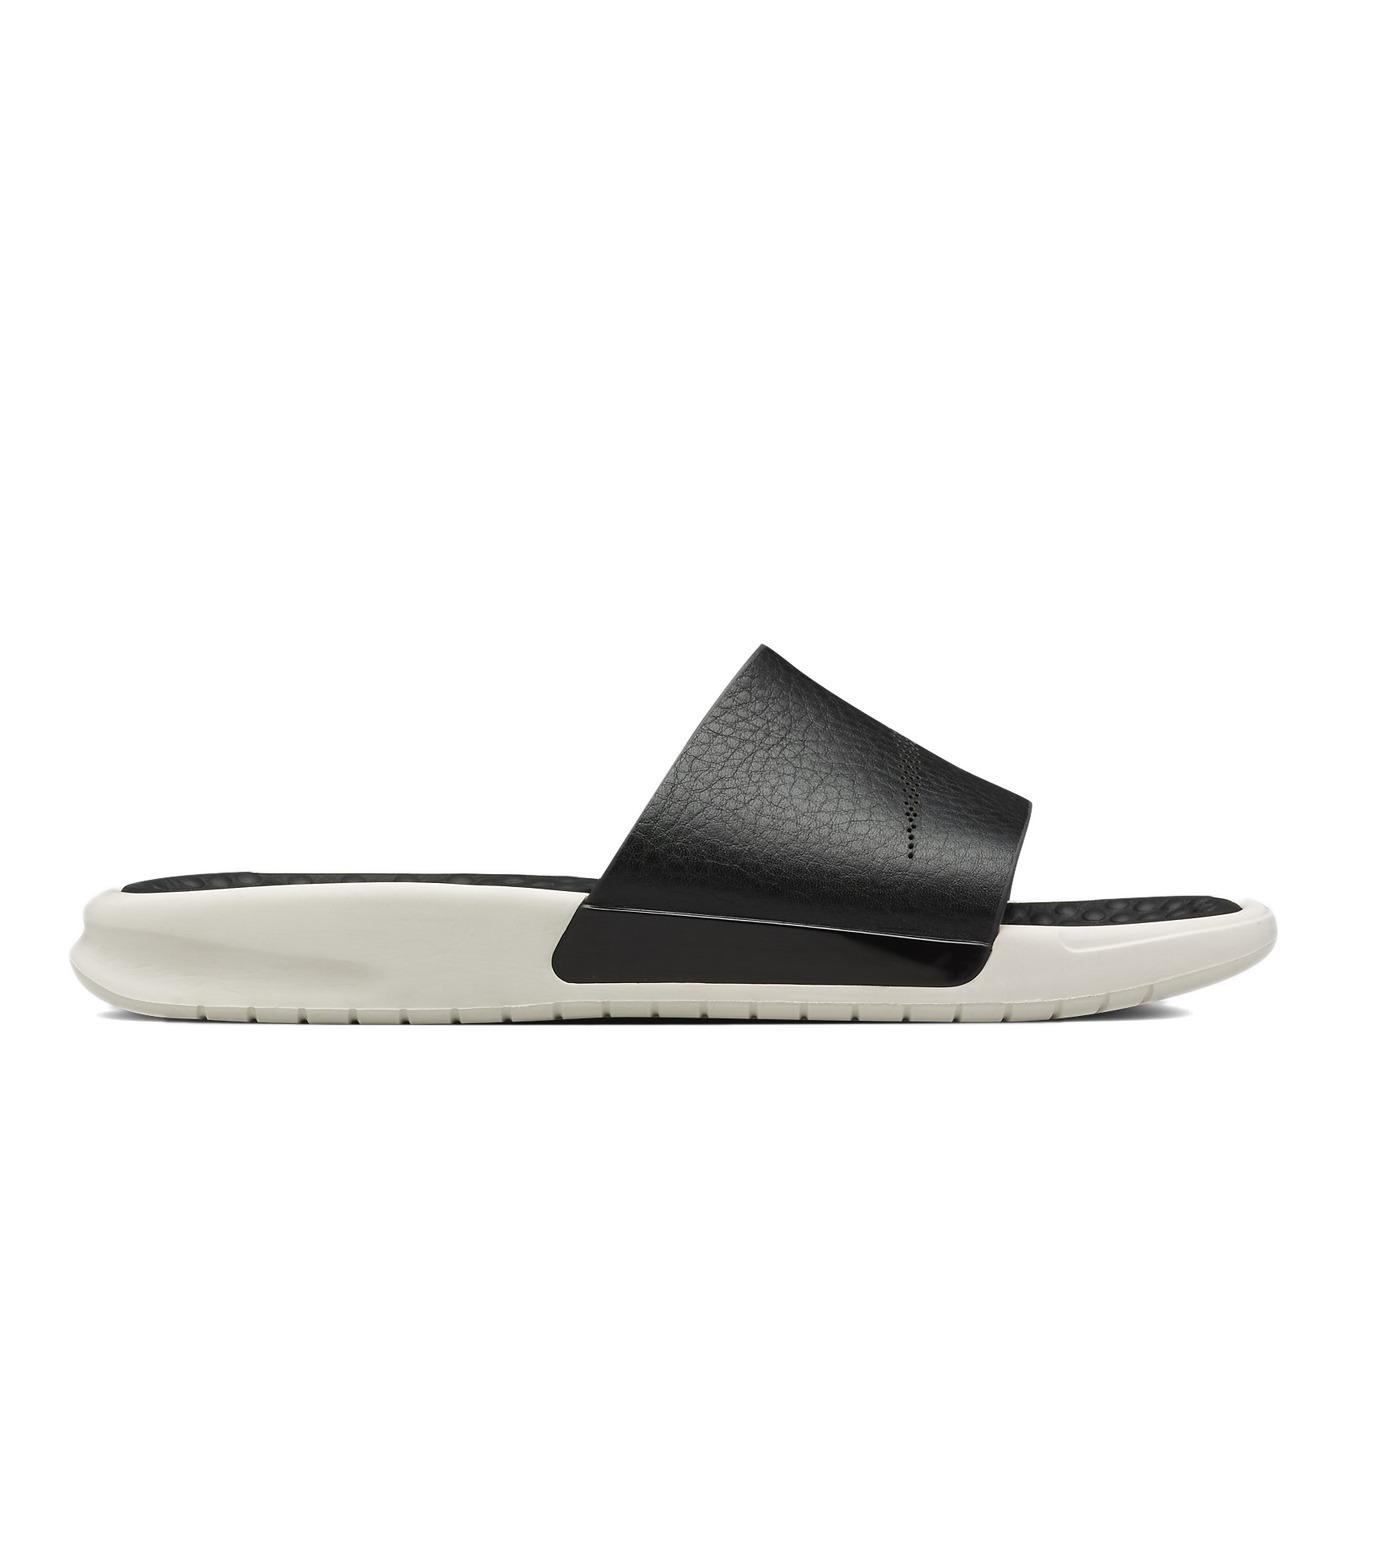 NIKE(ナイキ)のBenassi Slide Lux-BLACK(シューズ/shoes)-818742-001-13 拡大詳細画像1